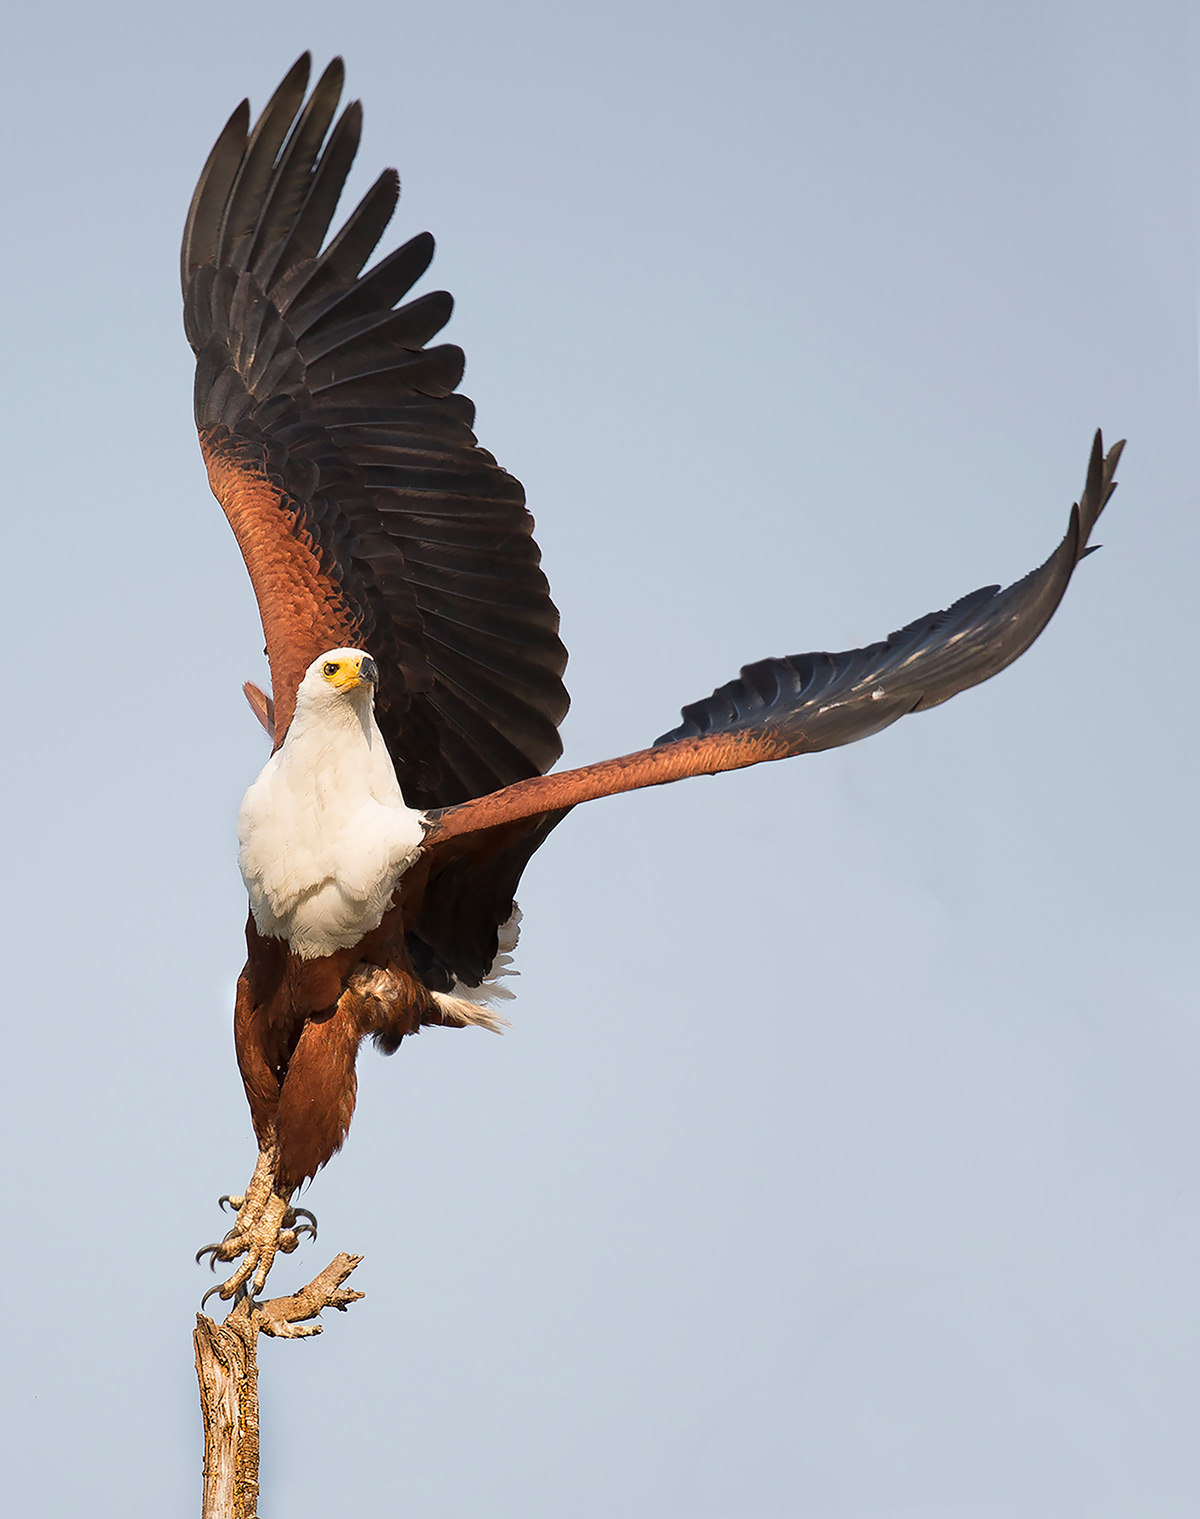 A fish eagle takes flight in Lower Zambezi National Park, Zambia © Carol Barry